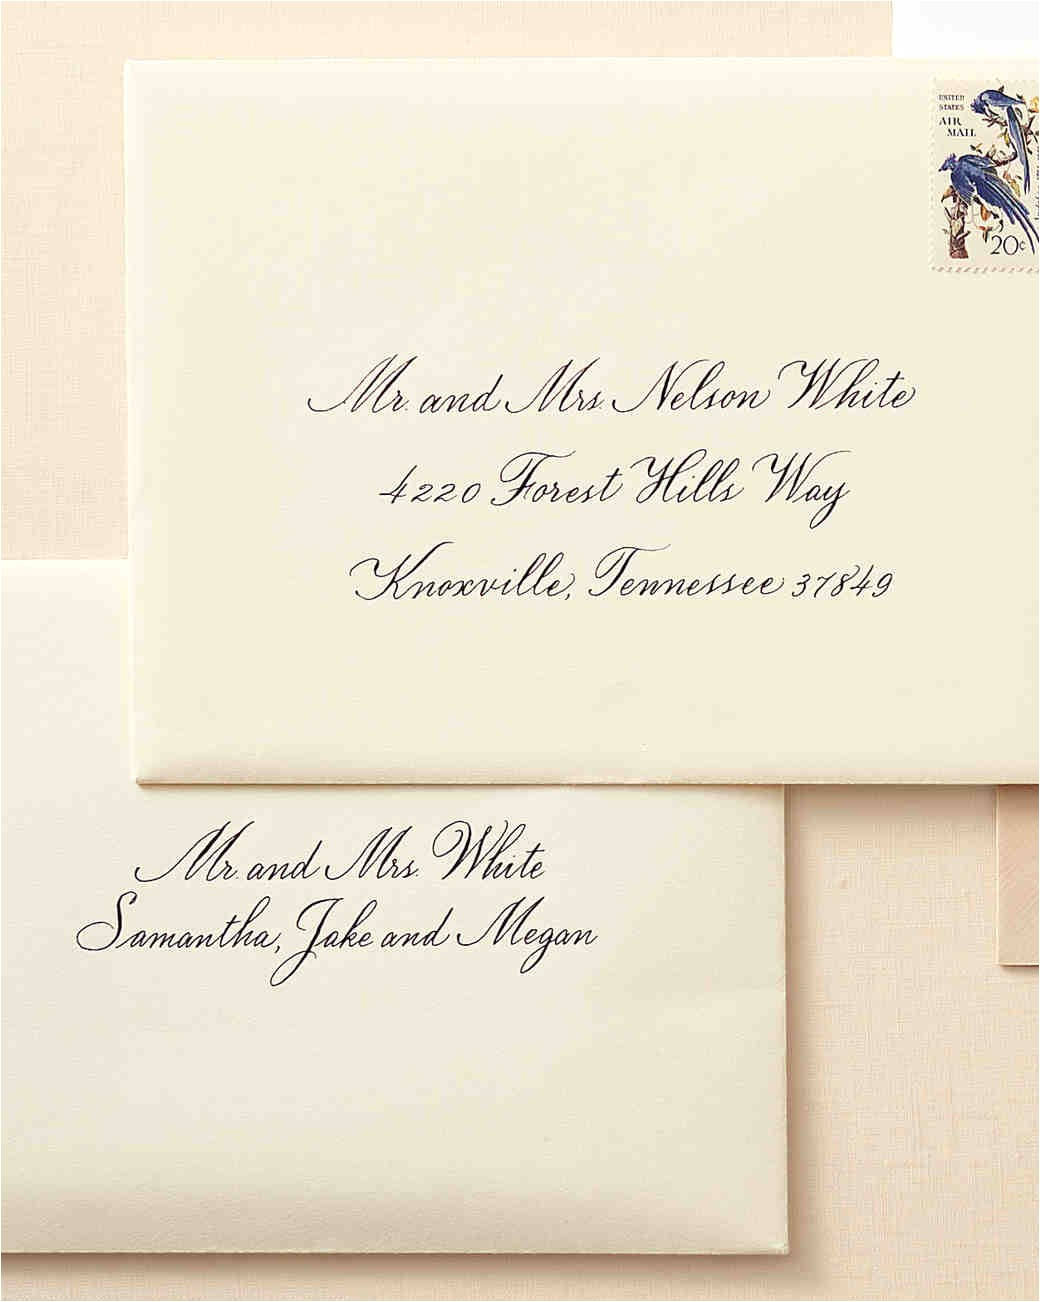 how to address wedding invitation envelopes